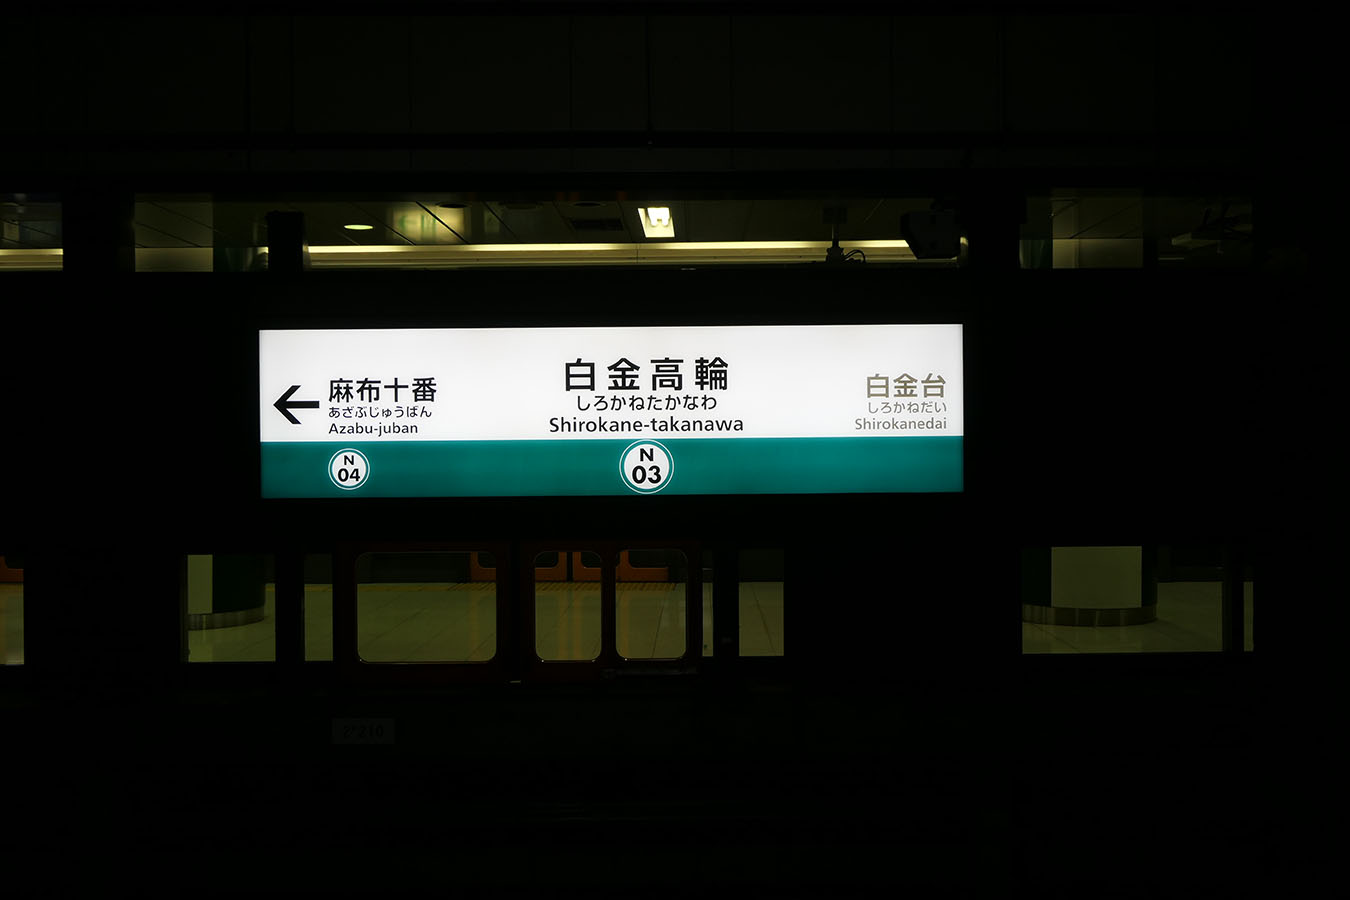 N03_photo04.jpg